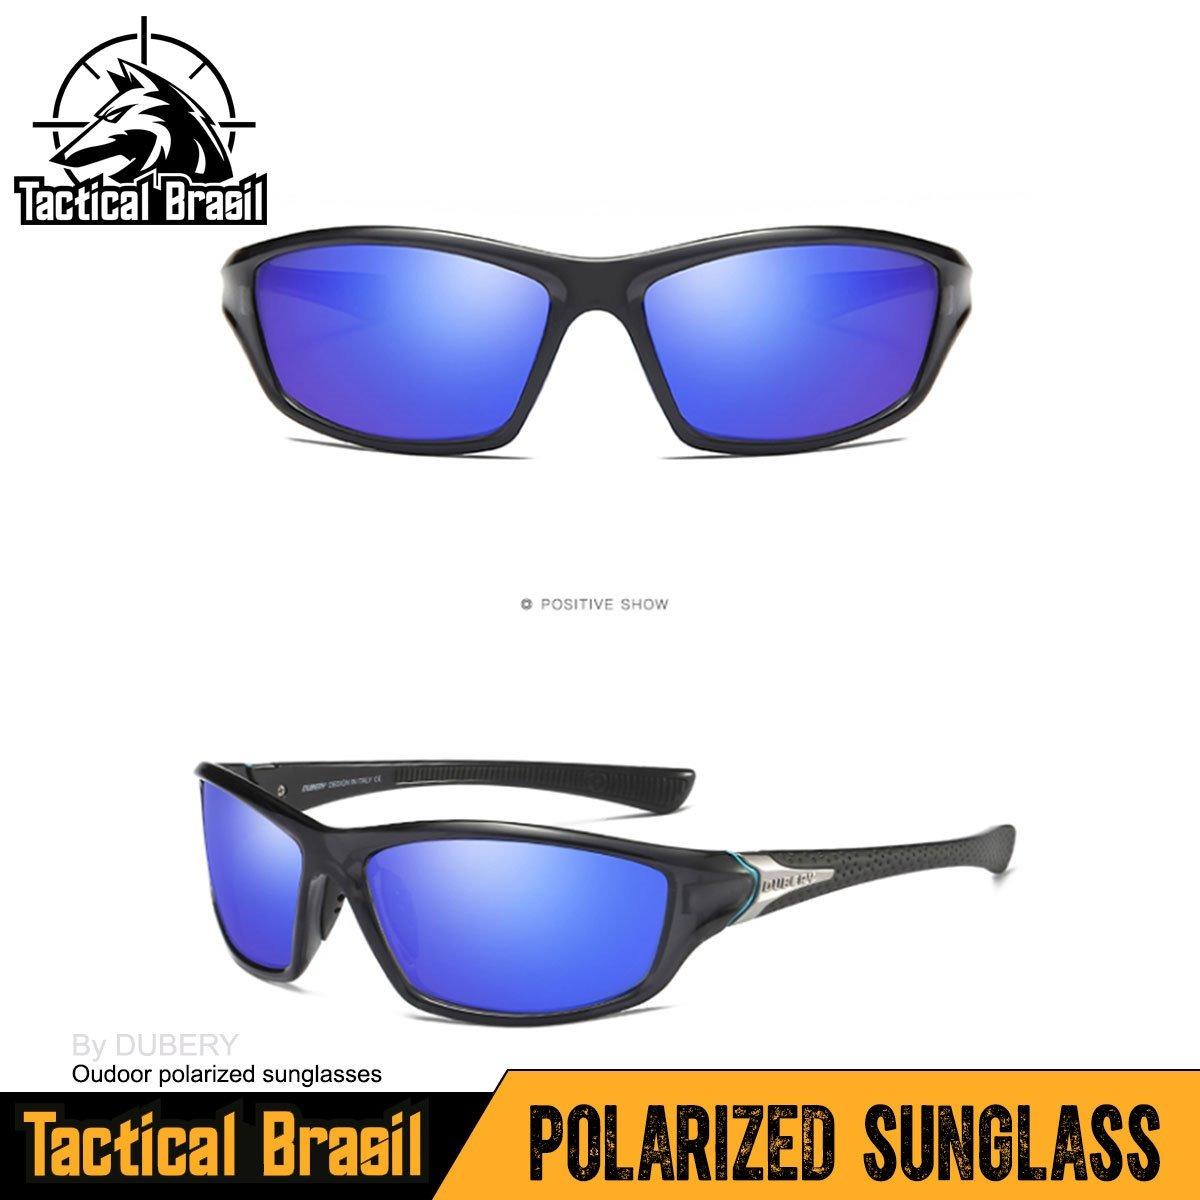 a0fa97536a270 óculos de sol maculino polarizado hd uv400 dubery mazarine. Carregando zoom.